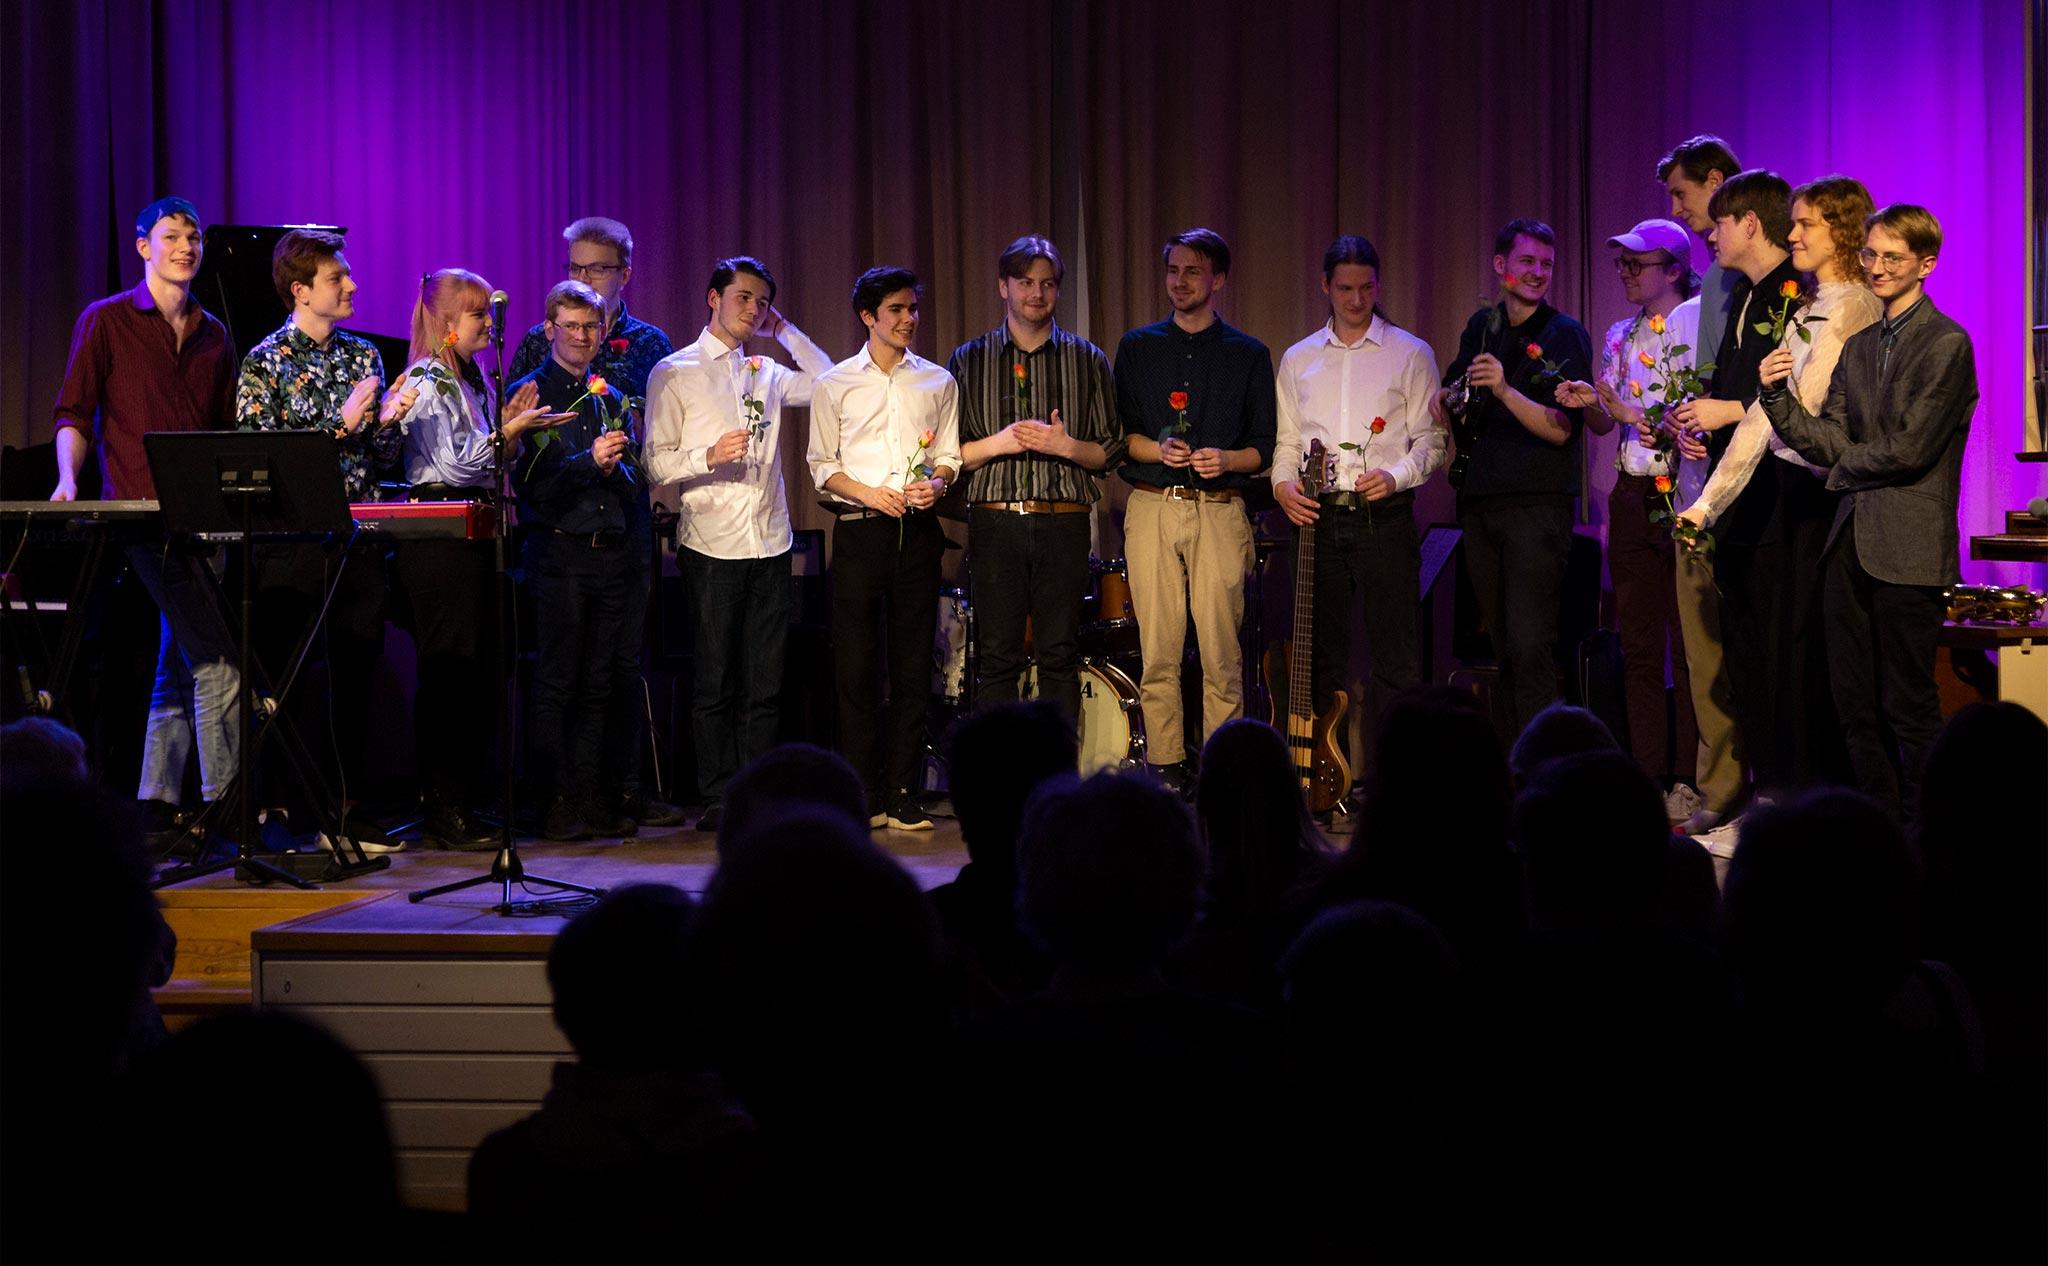 jazzkvall-2020-02-05-utvald